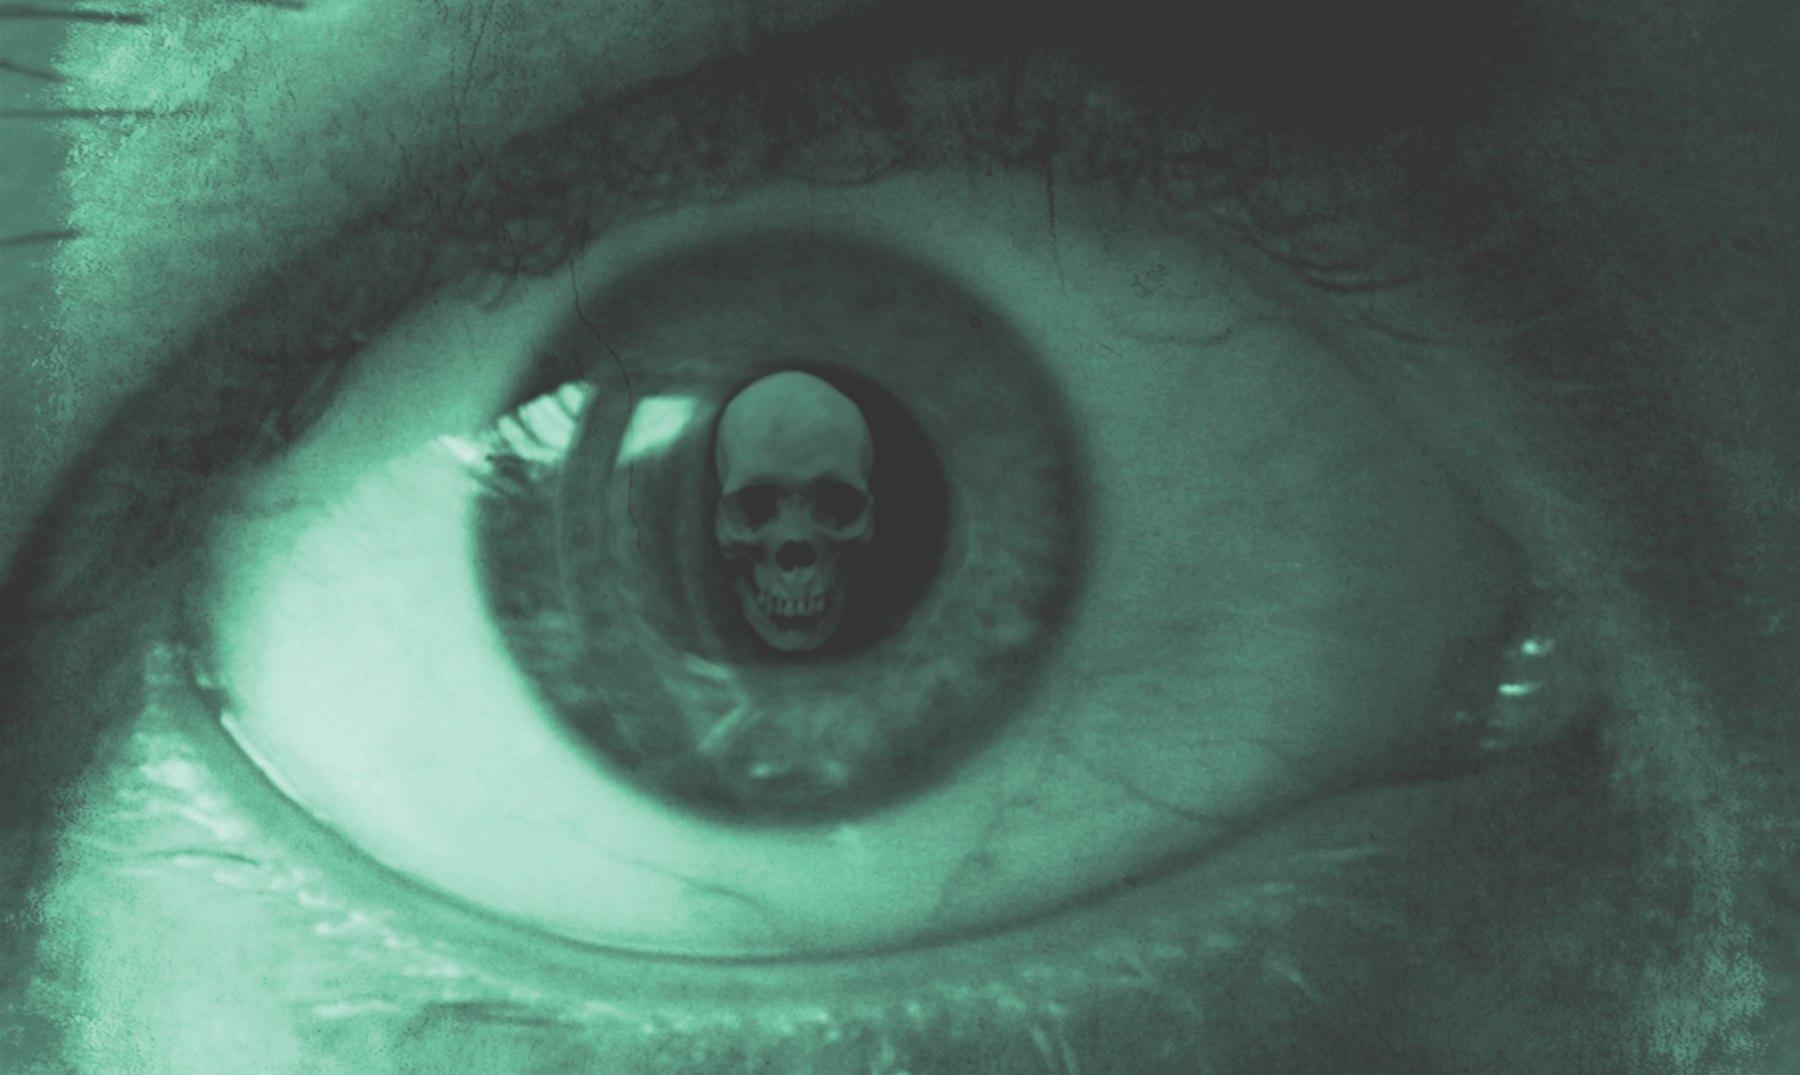 5 Extrañas formas de morir (Parte II)